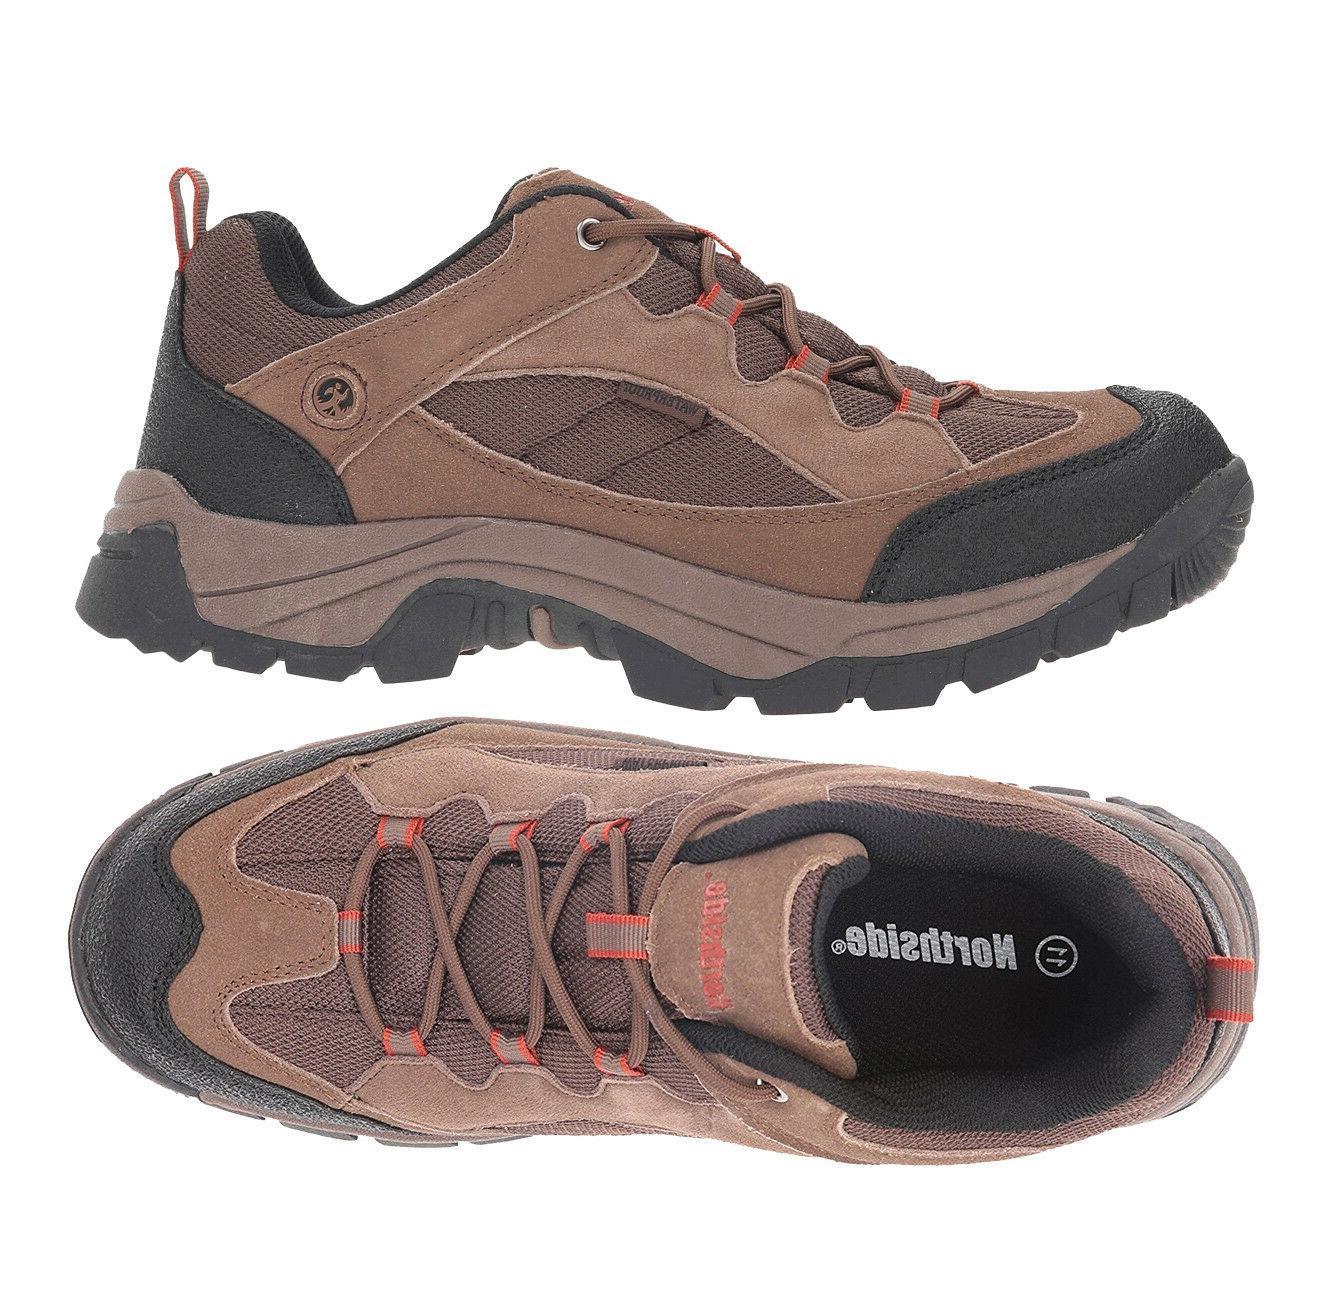 Mens Shoes Waterproof Hiking Boots Brown Suede Northside Mon